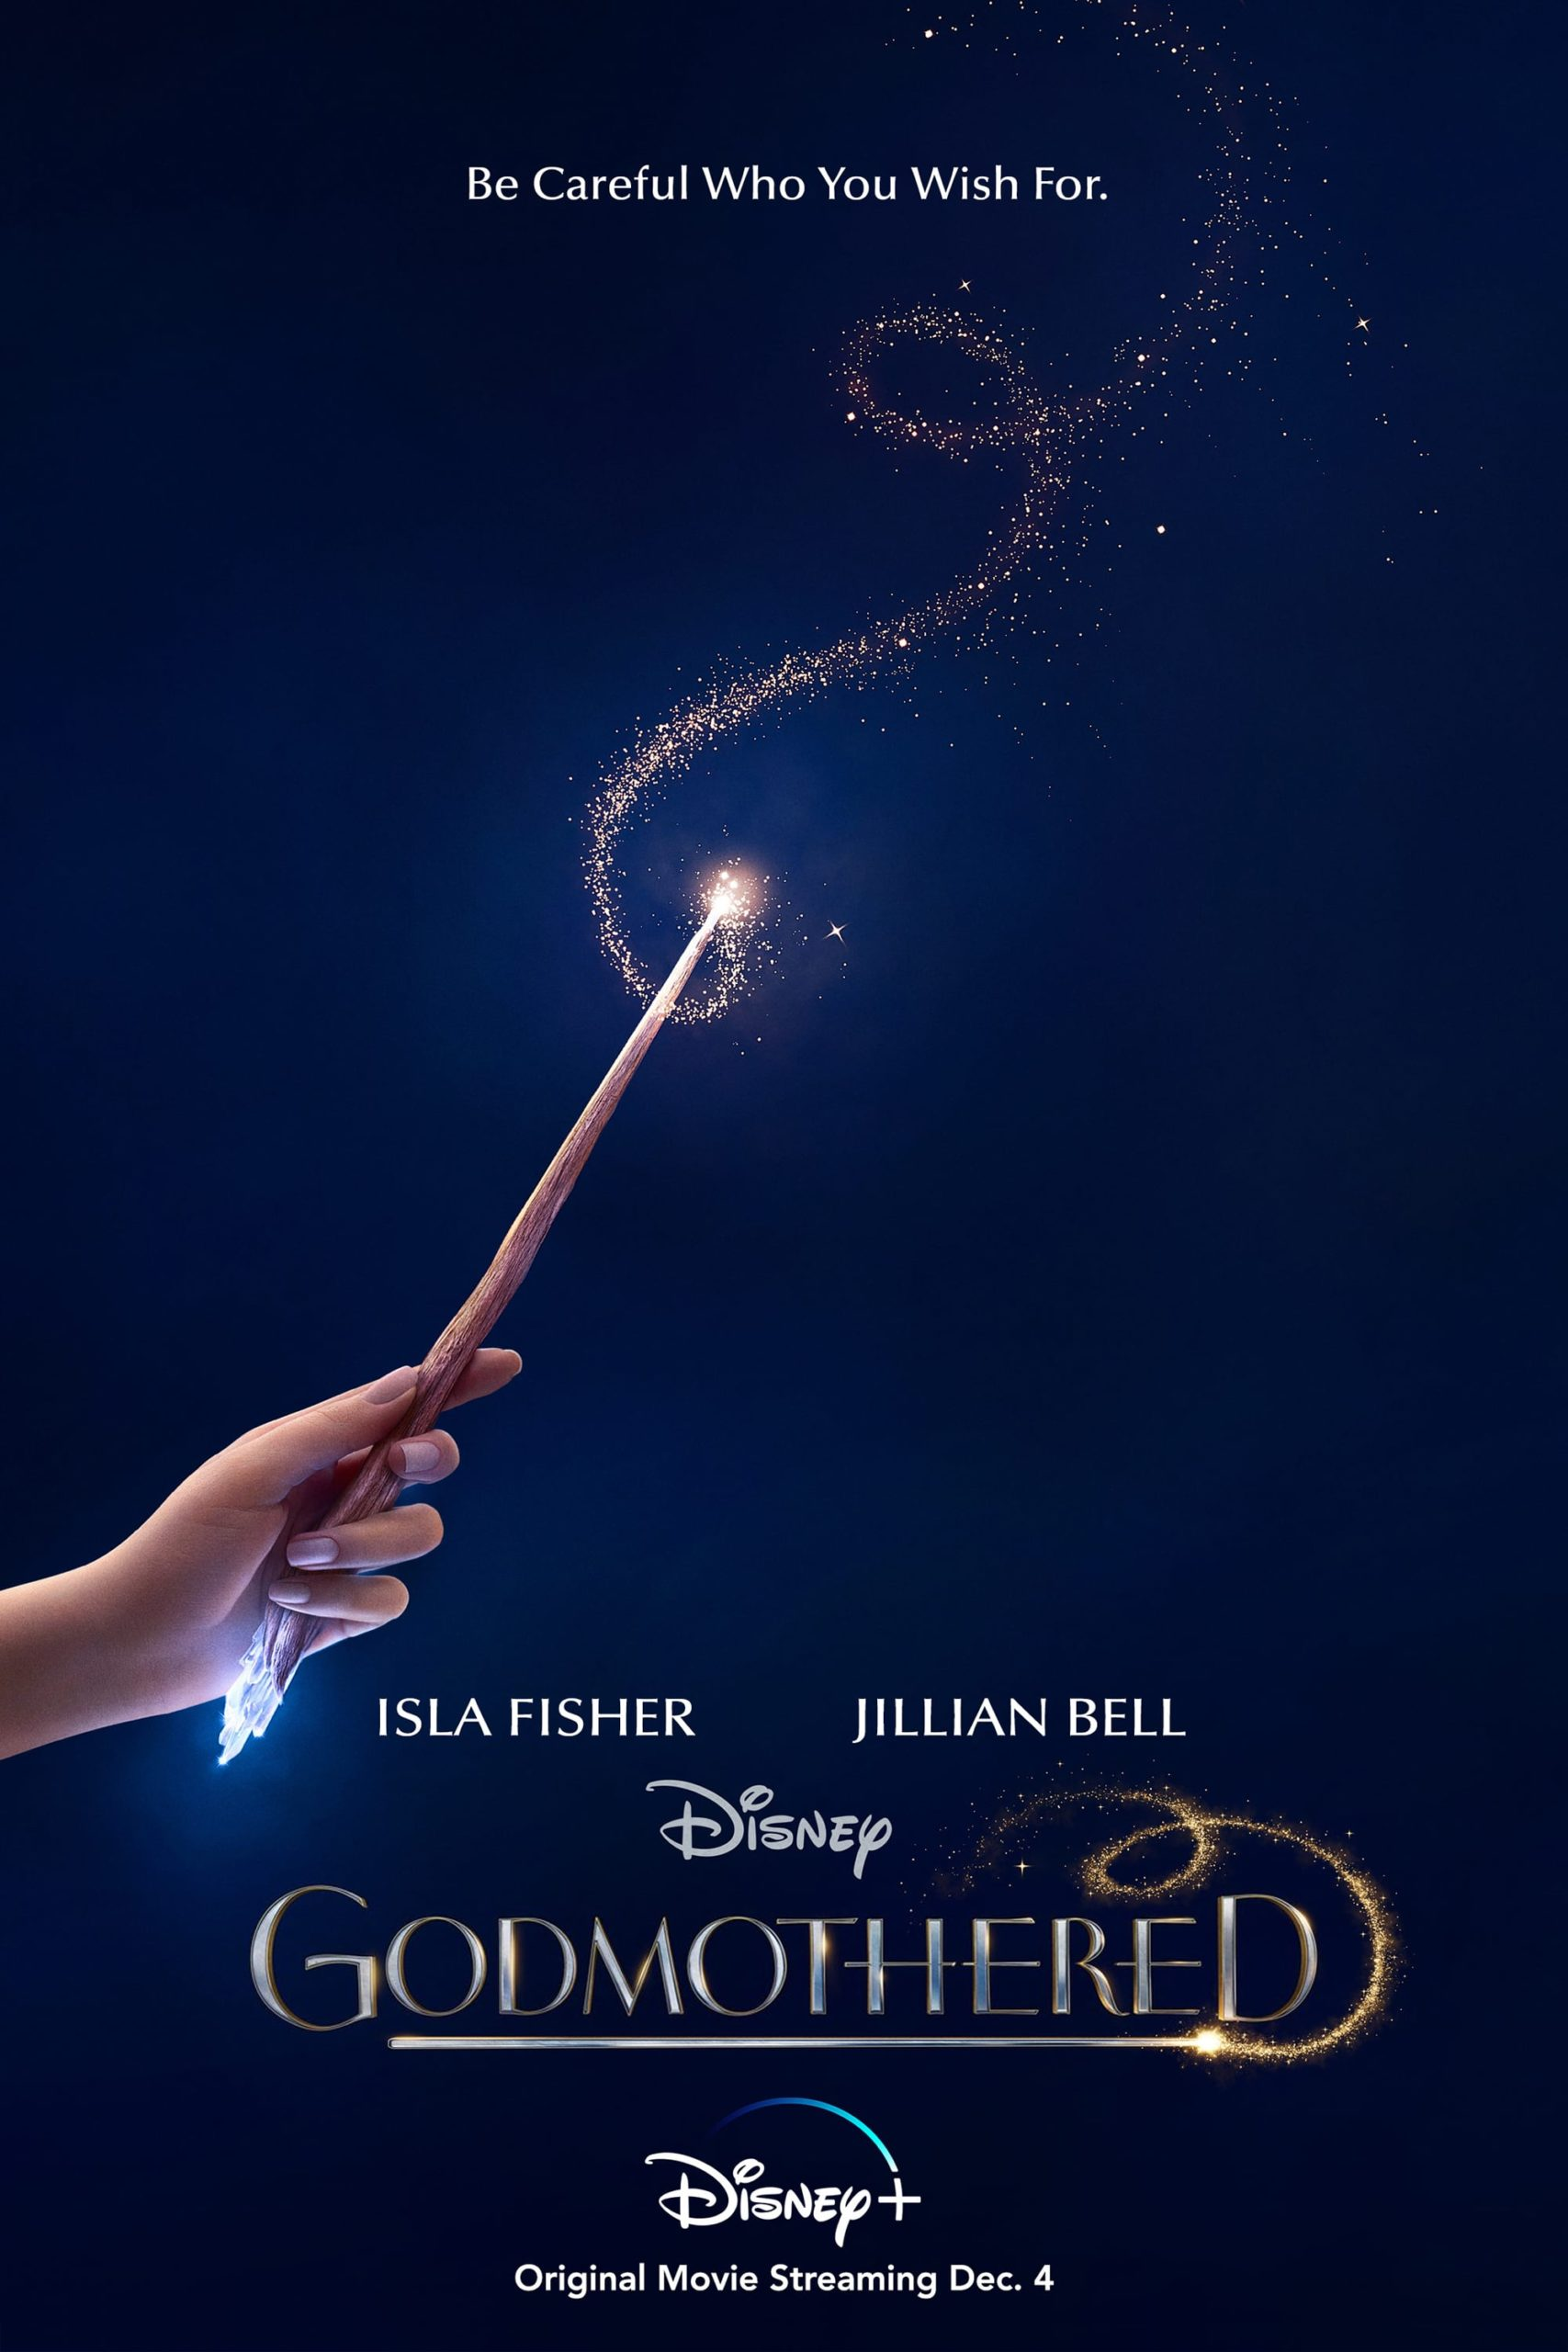 Godmothered poster